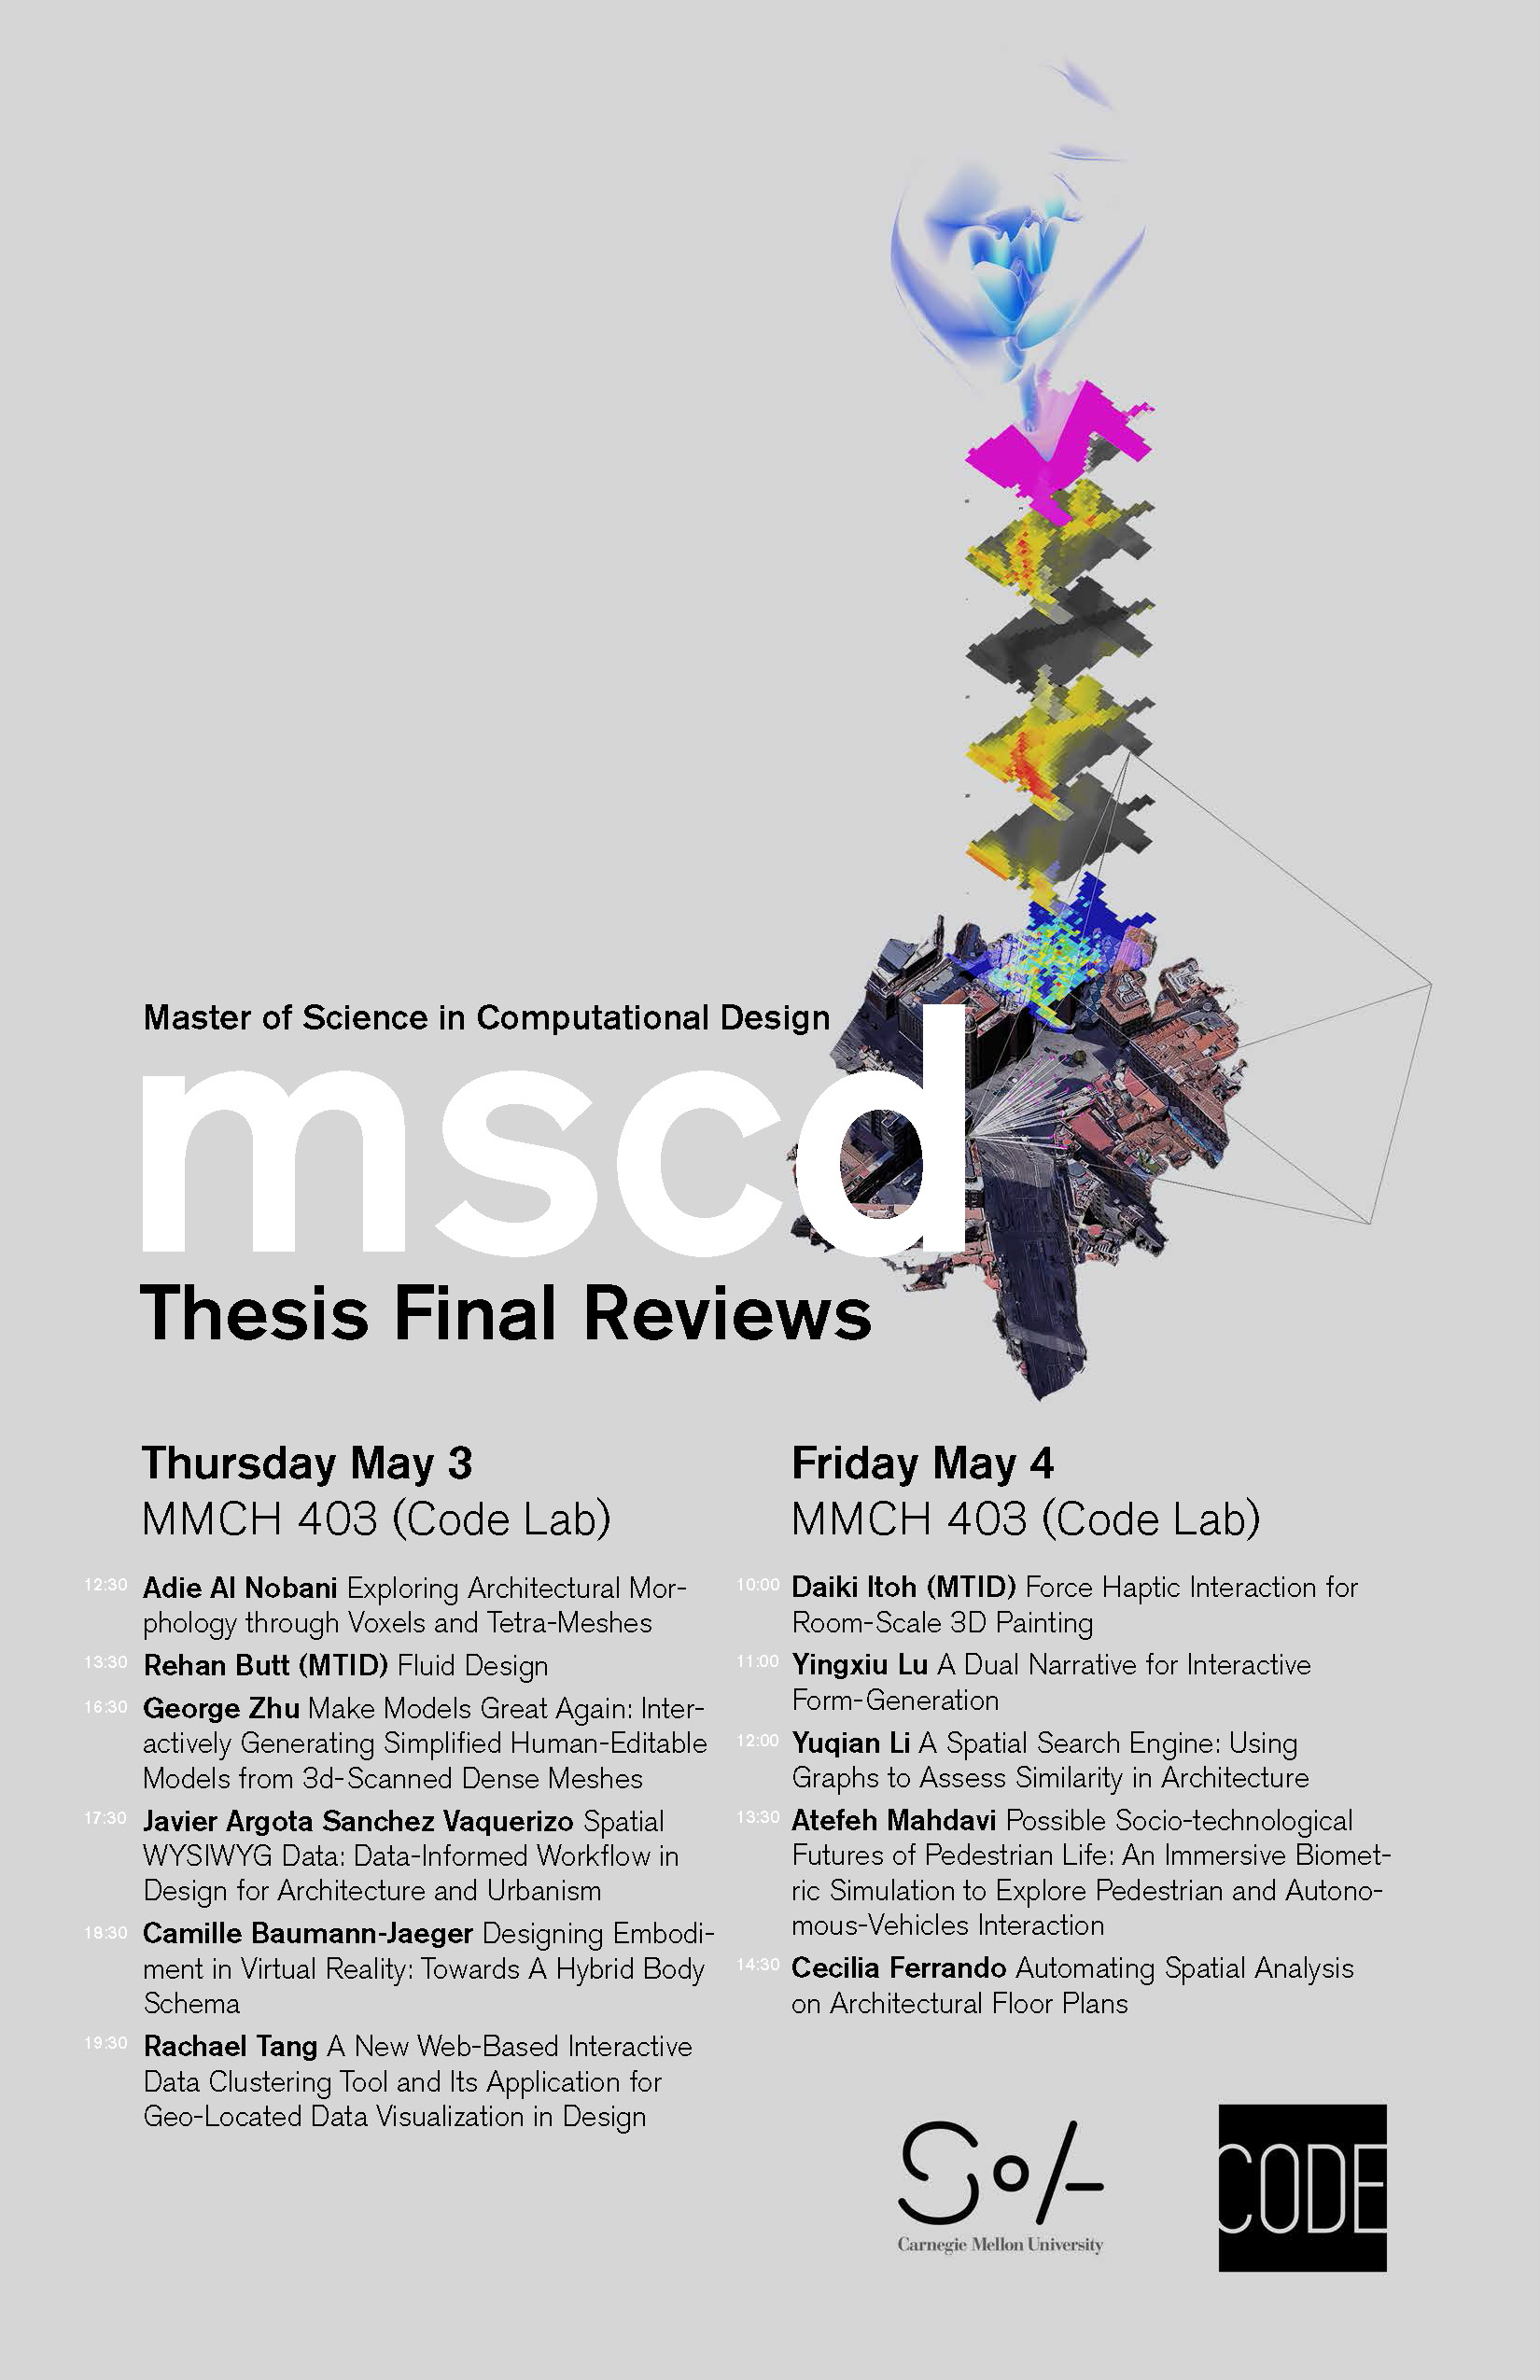 MSCD-FinalThesis_S18_lt - Daniel Cardoso Llach.jpg